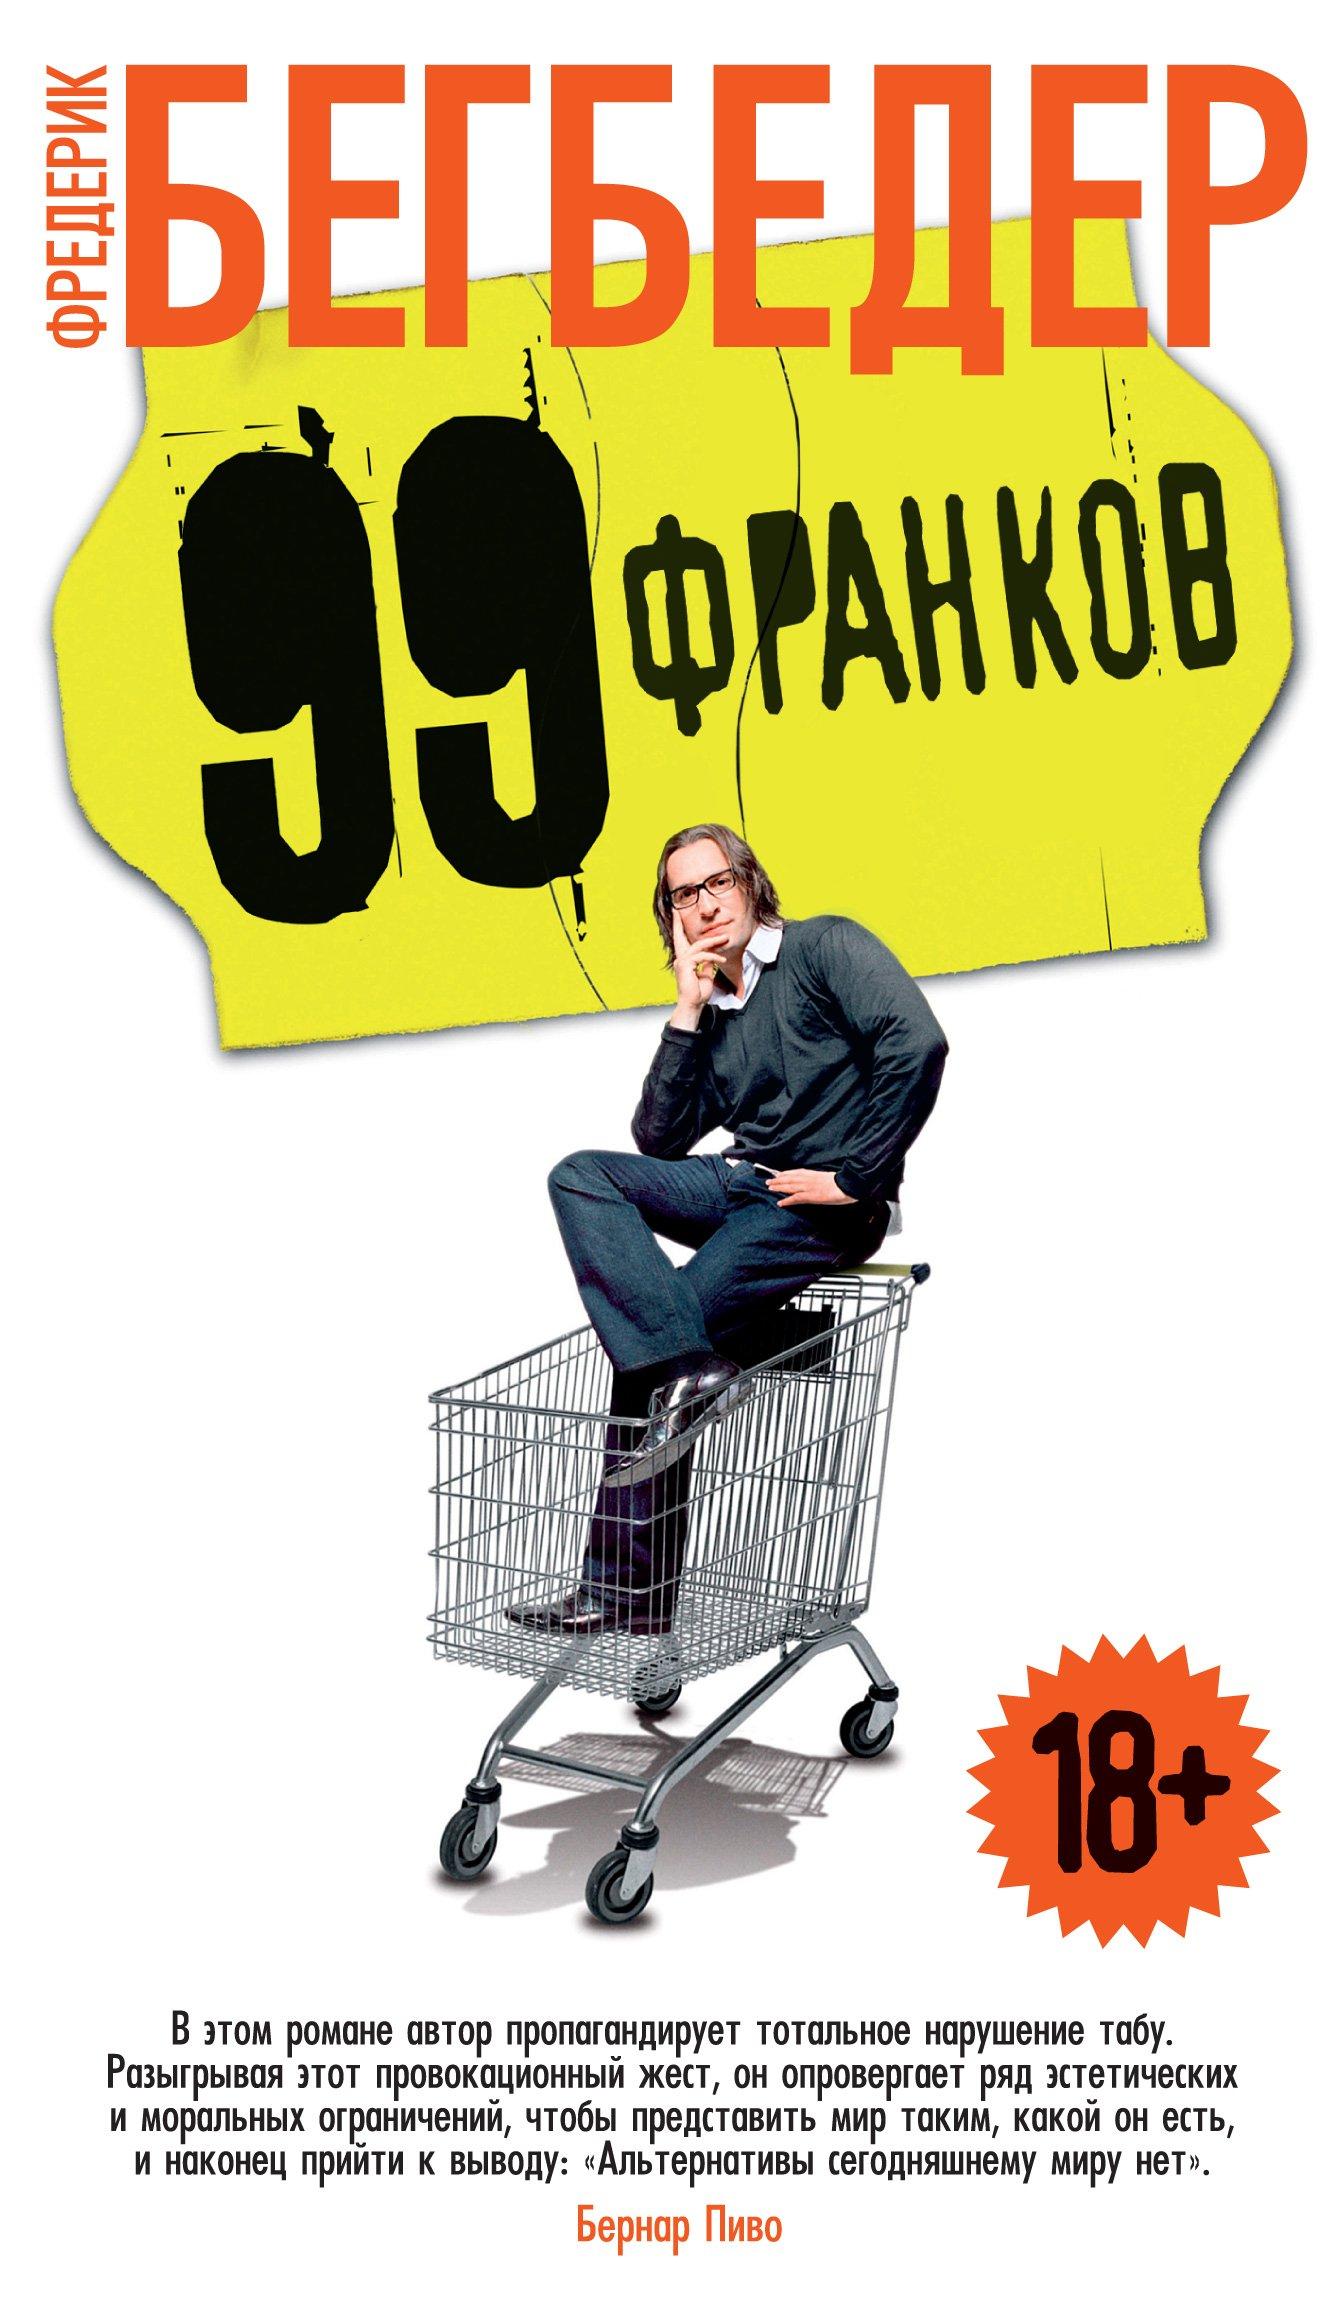 Бегбедер Фредерик 99 франков (нов/обл.)